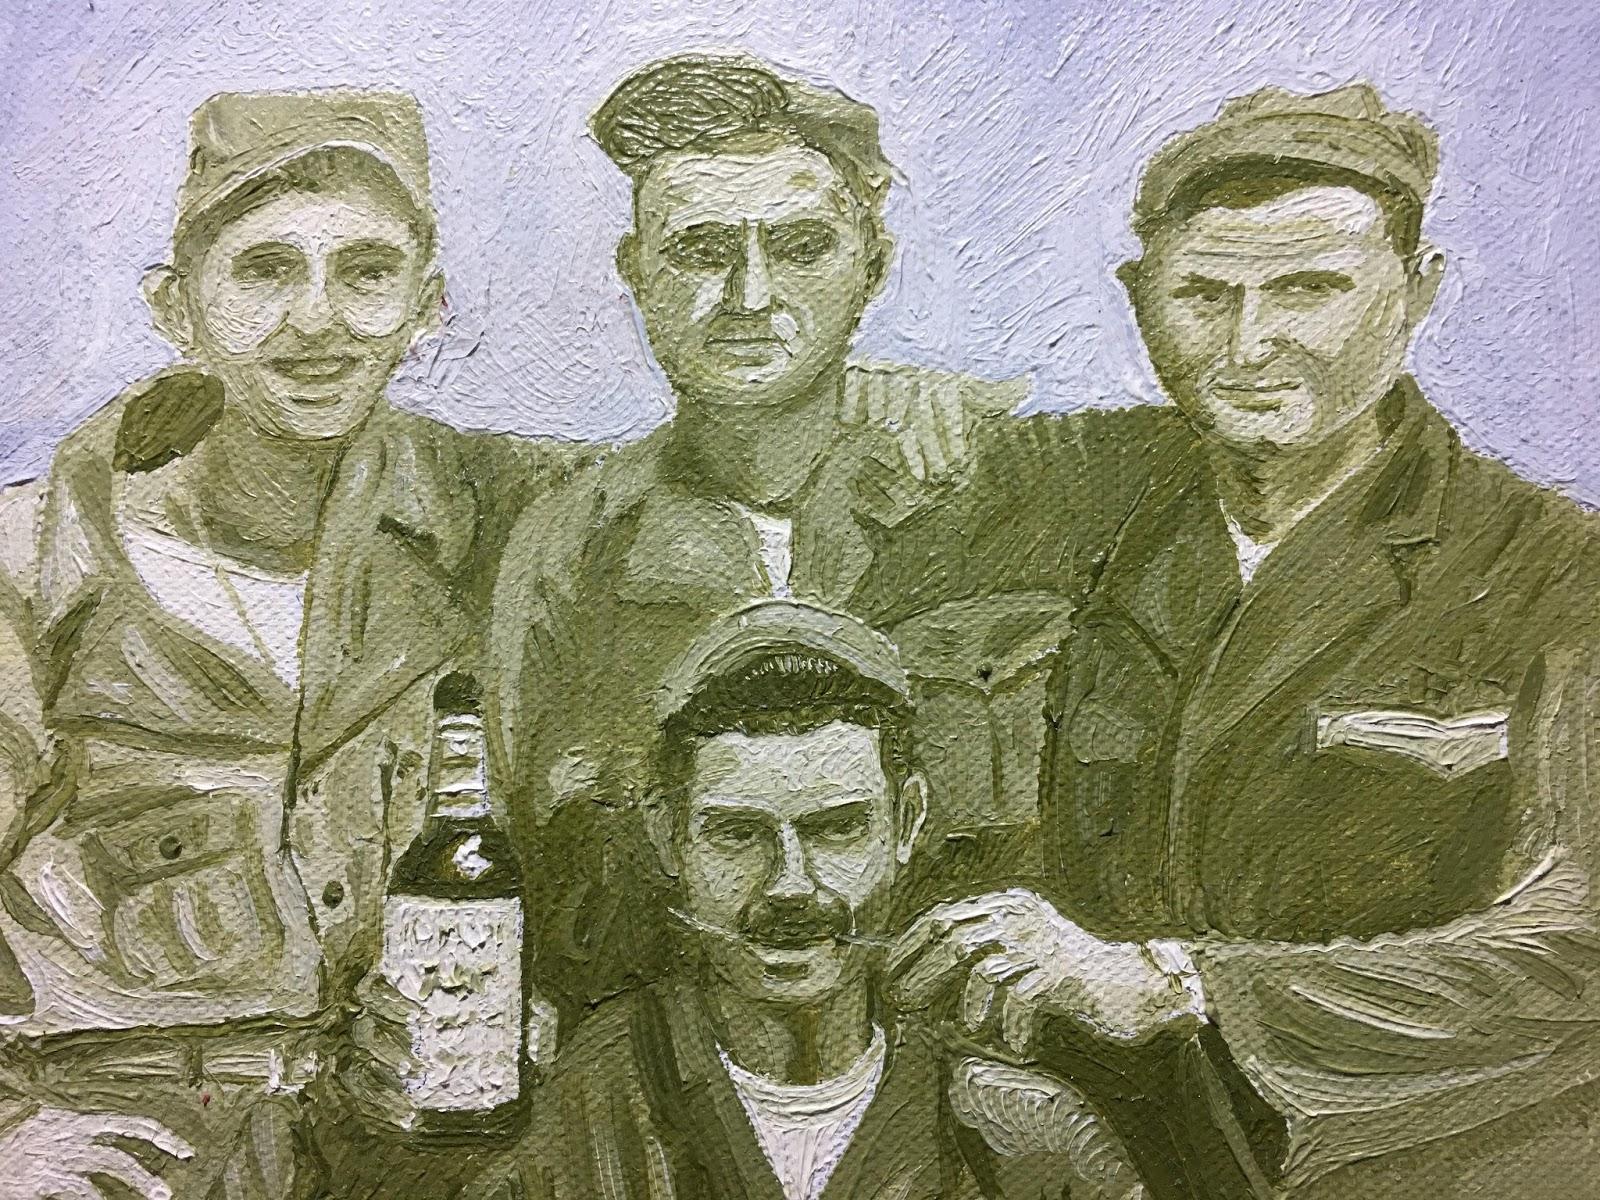 http://www.alanmizell.com/2017/03/uncle-joe-dash-korea-1952-oil-on-canvas.html